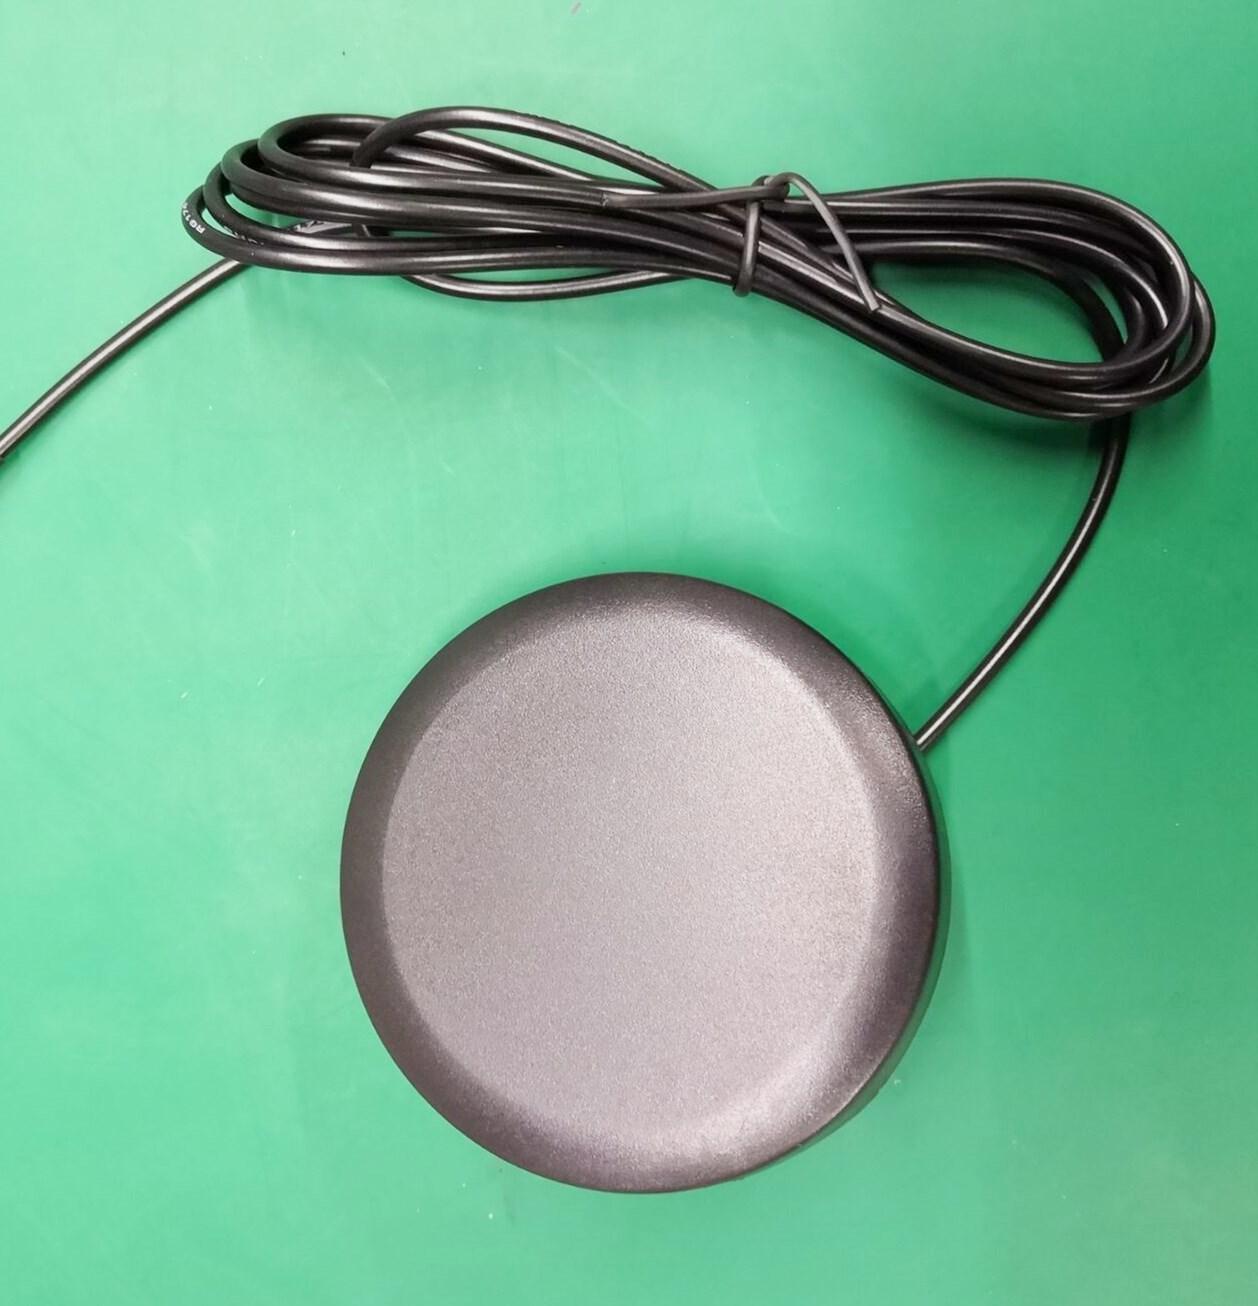 waterproof outdoor GSM 3g 4g lte Antenna, screw mount 4g antenna, FAKRA female 3